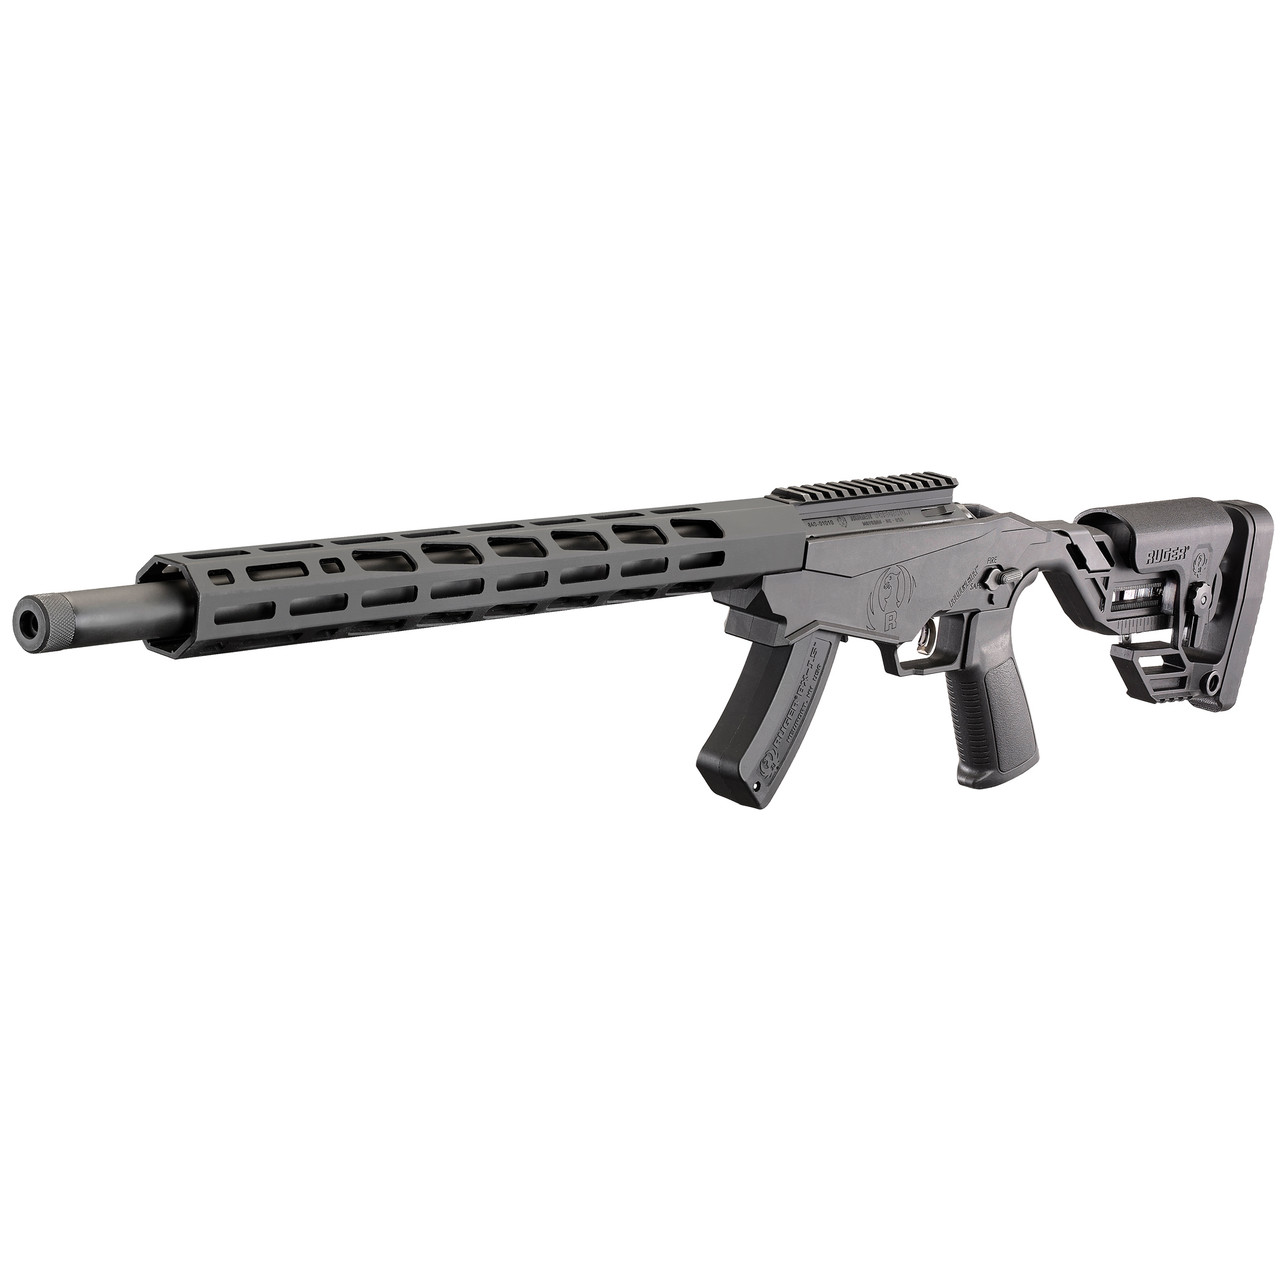 Ruger Precision Rimfire CALIFORNIA LEGAL - .22 LR